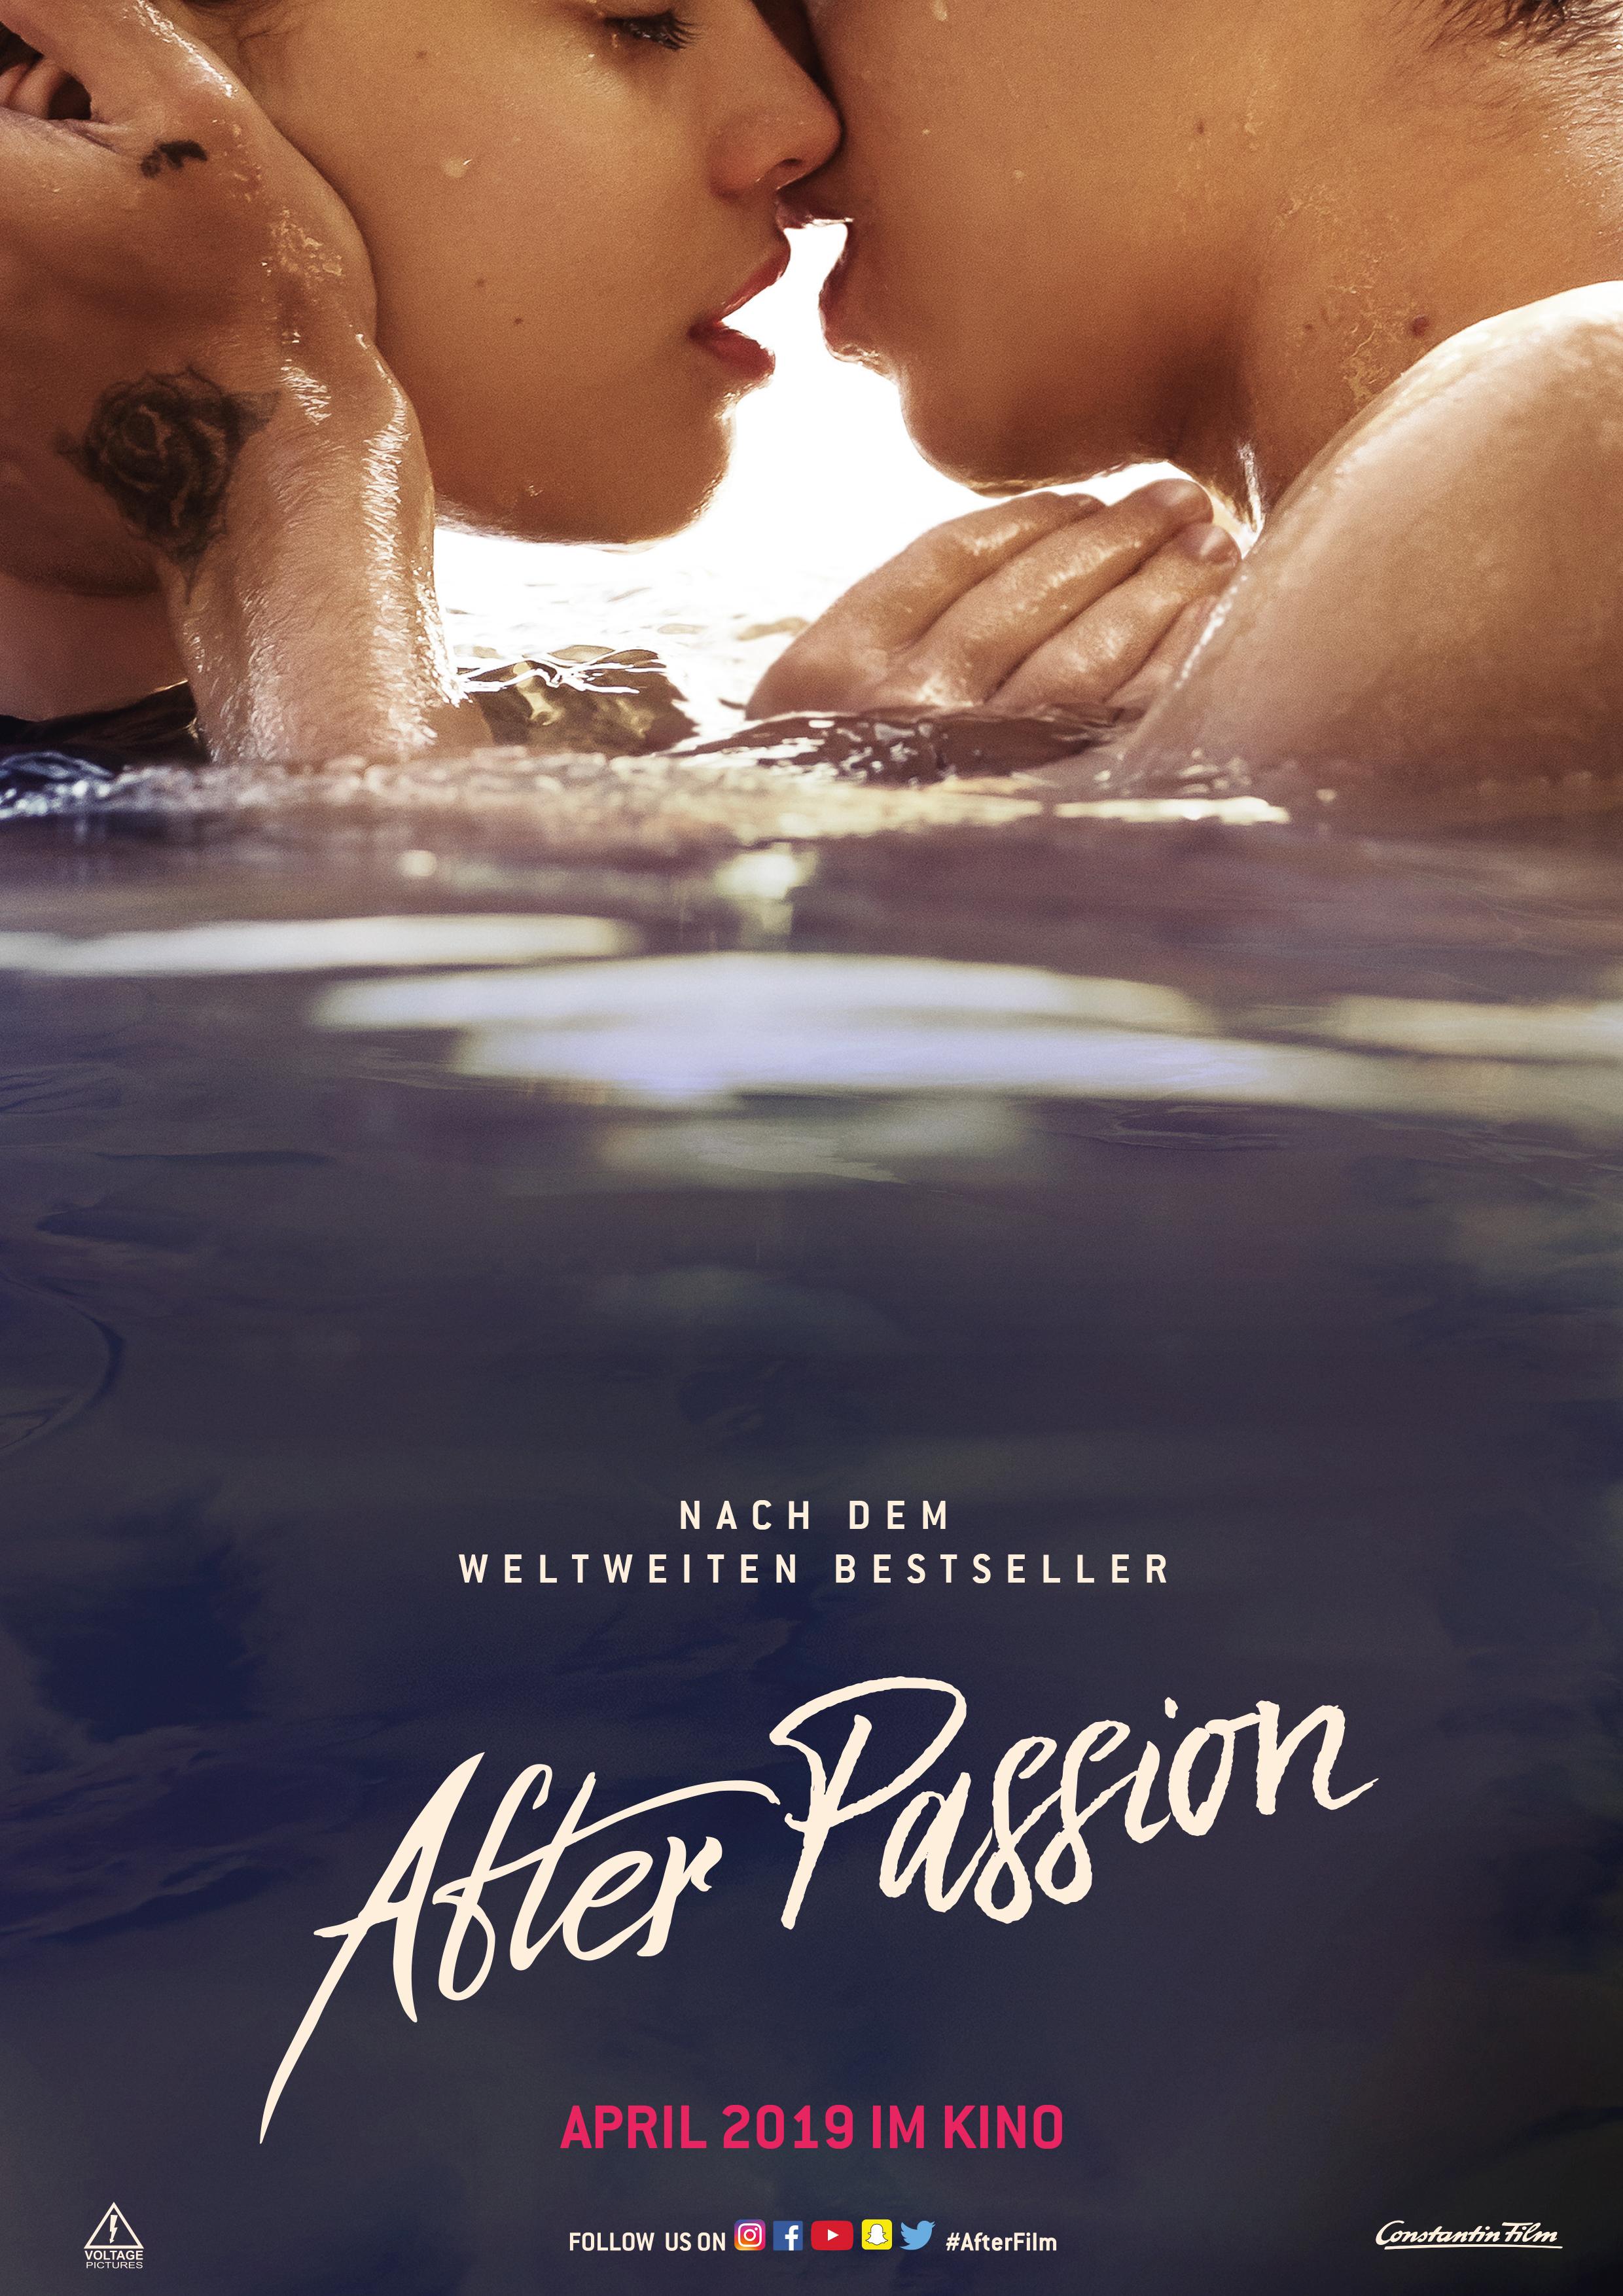 After Passion Ab 11 April 2019 Im Kino Presseportal